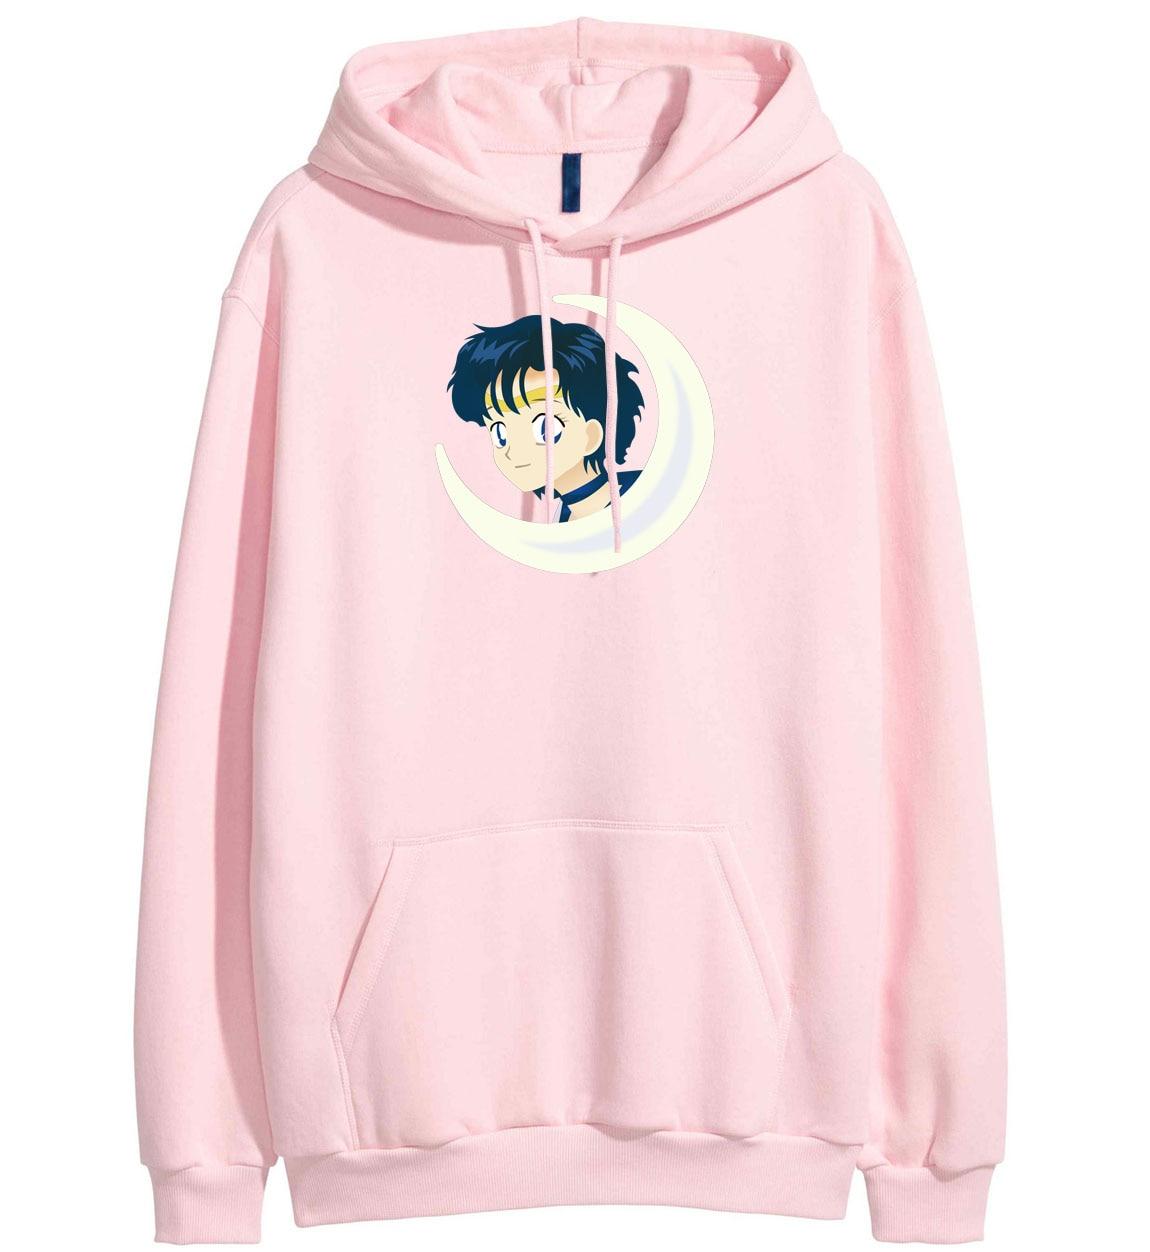 2019 New Arrival Hoodie For Women Brand Clothing SAILOR MOON Cartoon Print Kawaii Spring Fleece Winter Sweatshirt Harajuku Hoody